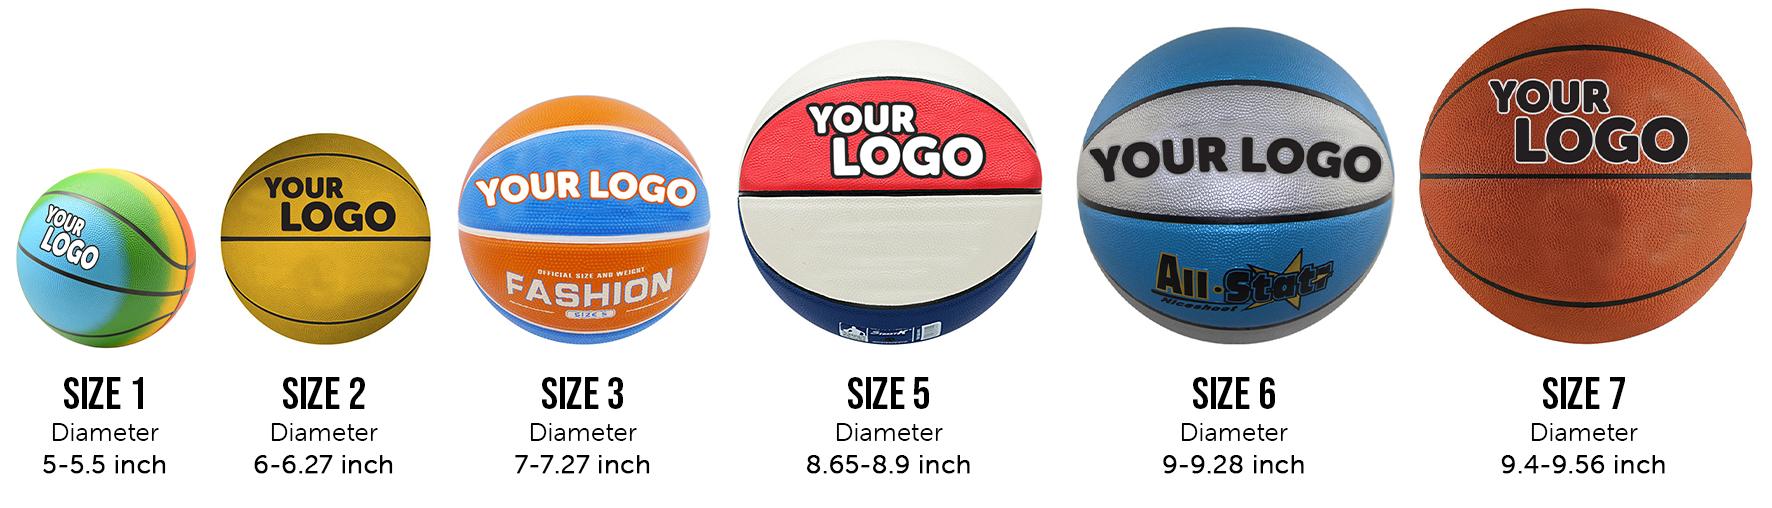 Basketball-Sizes.jpg